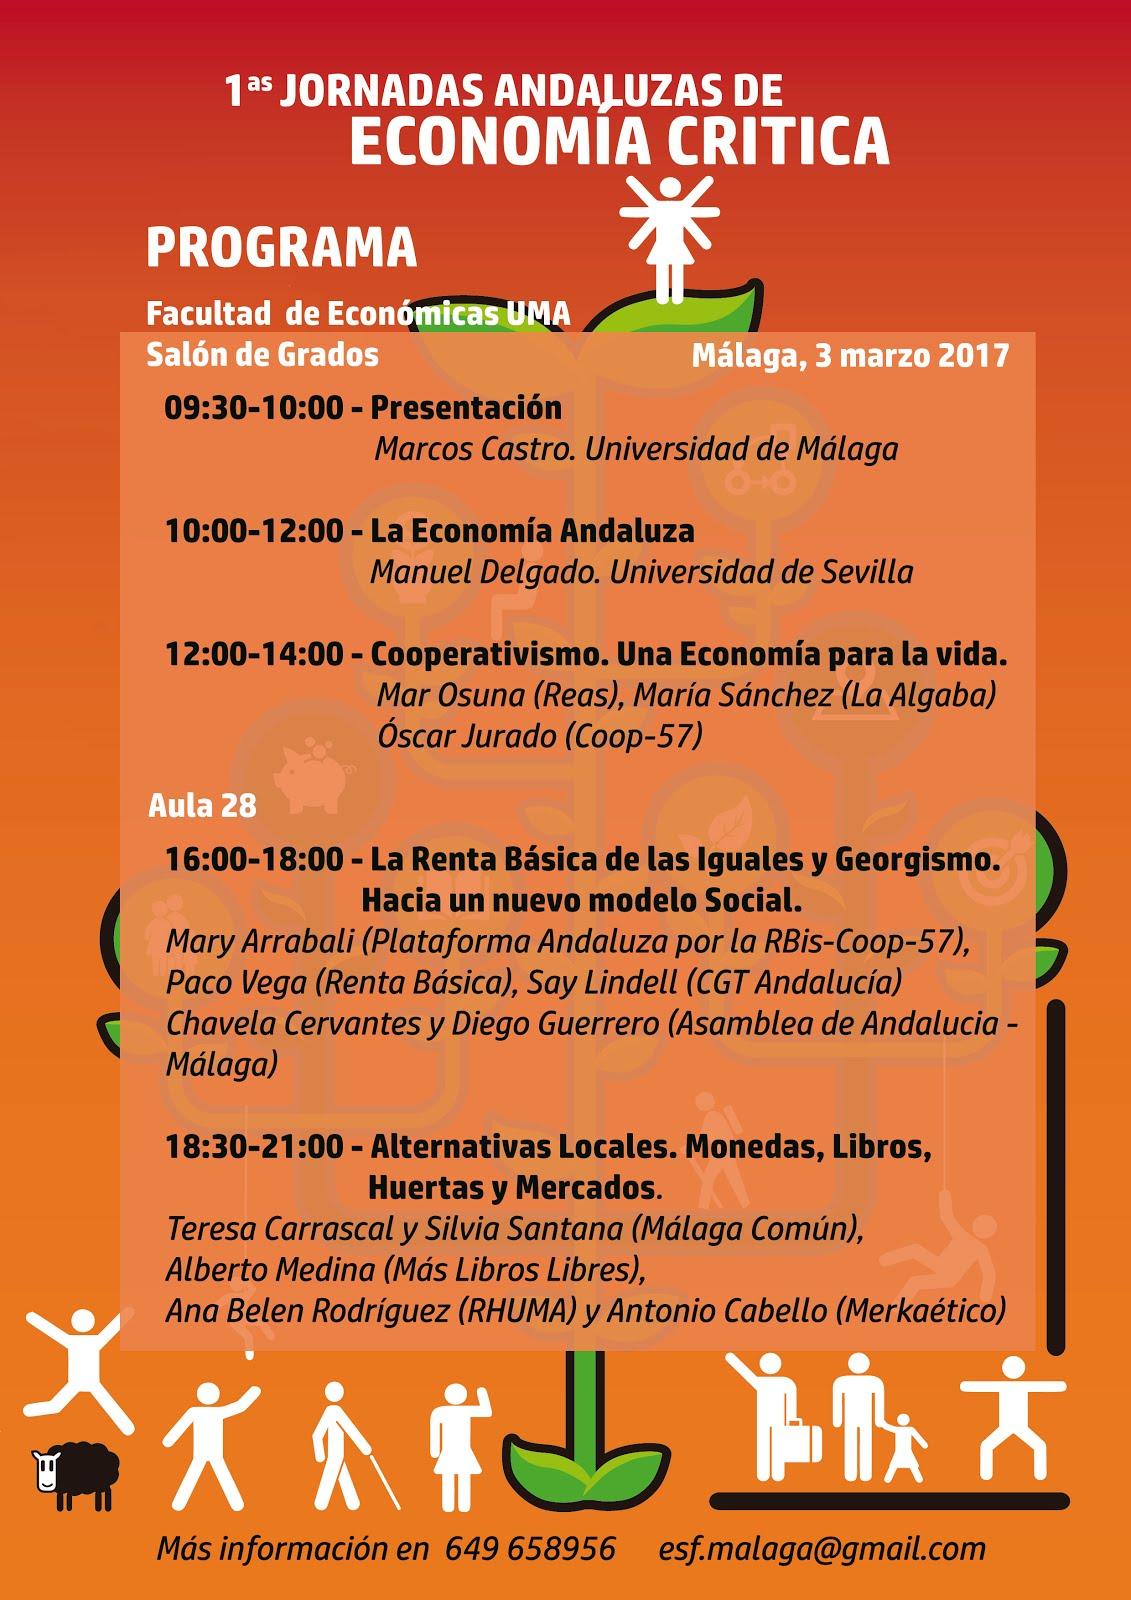 1ª Jornadas Andaluzas de ECONOMÍA CRÍTICA.